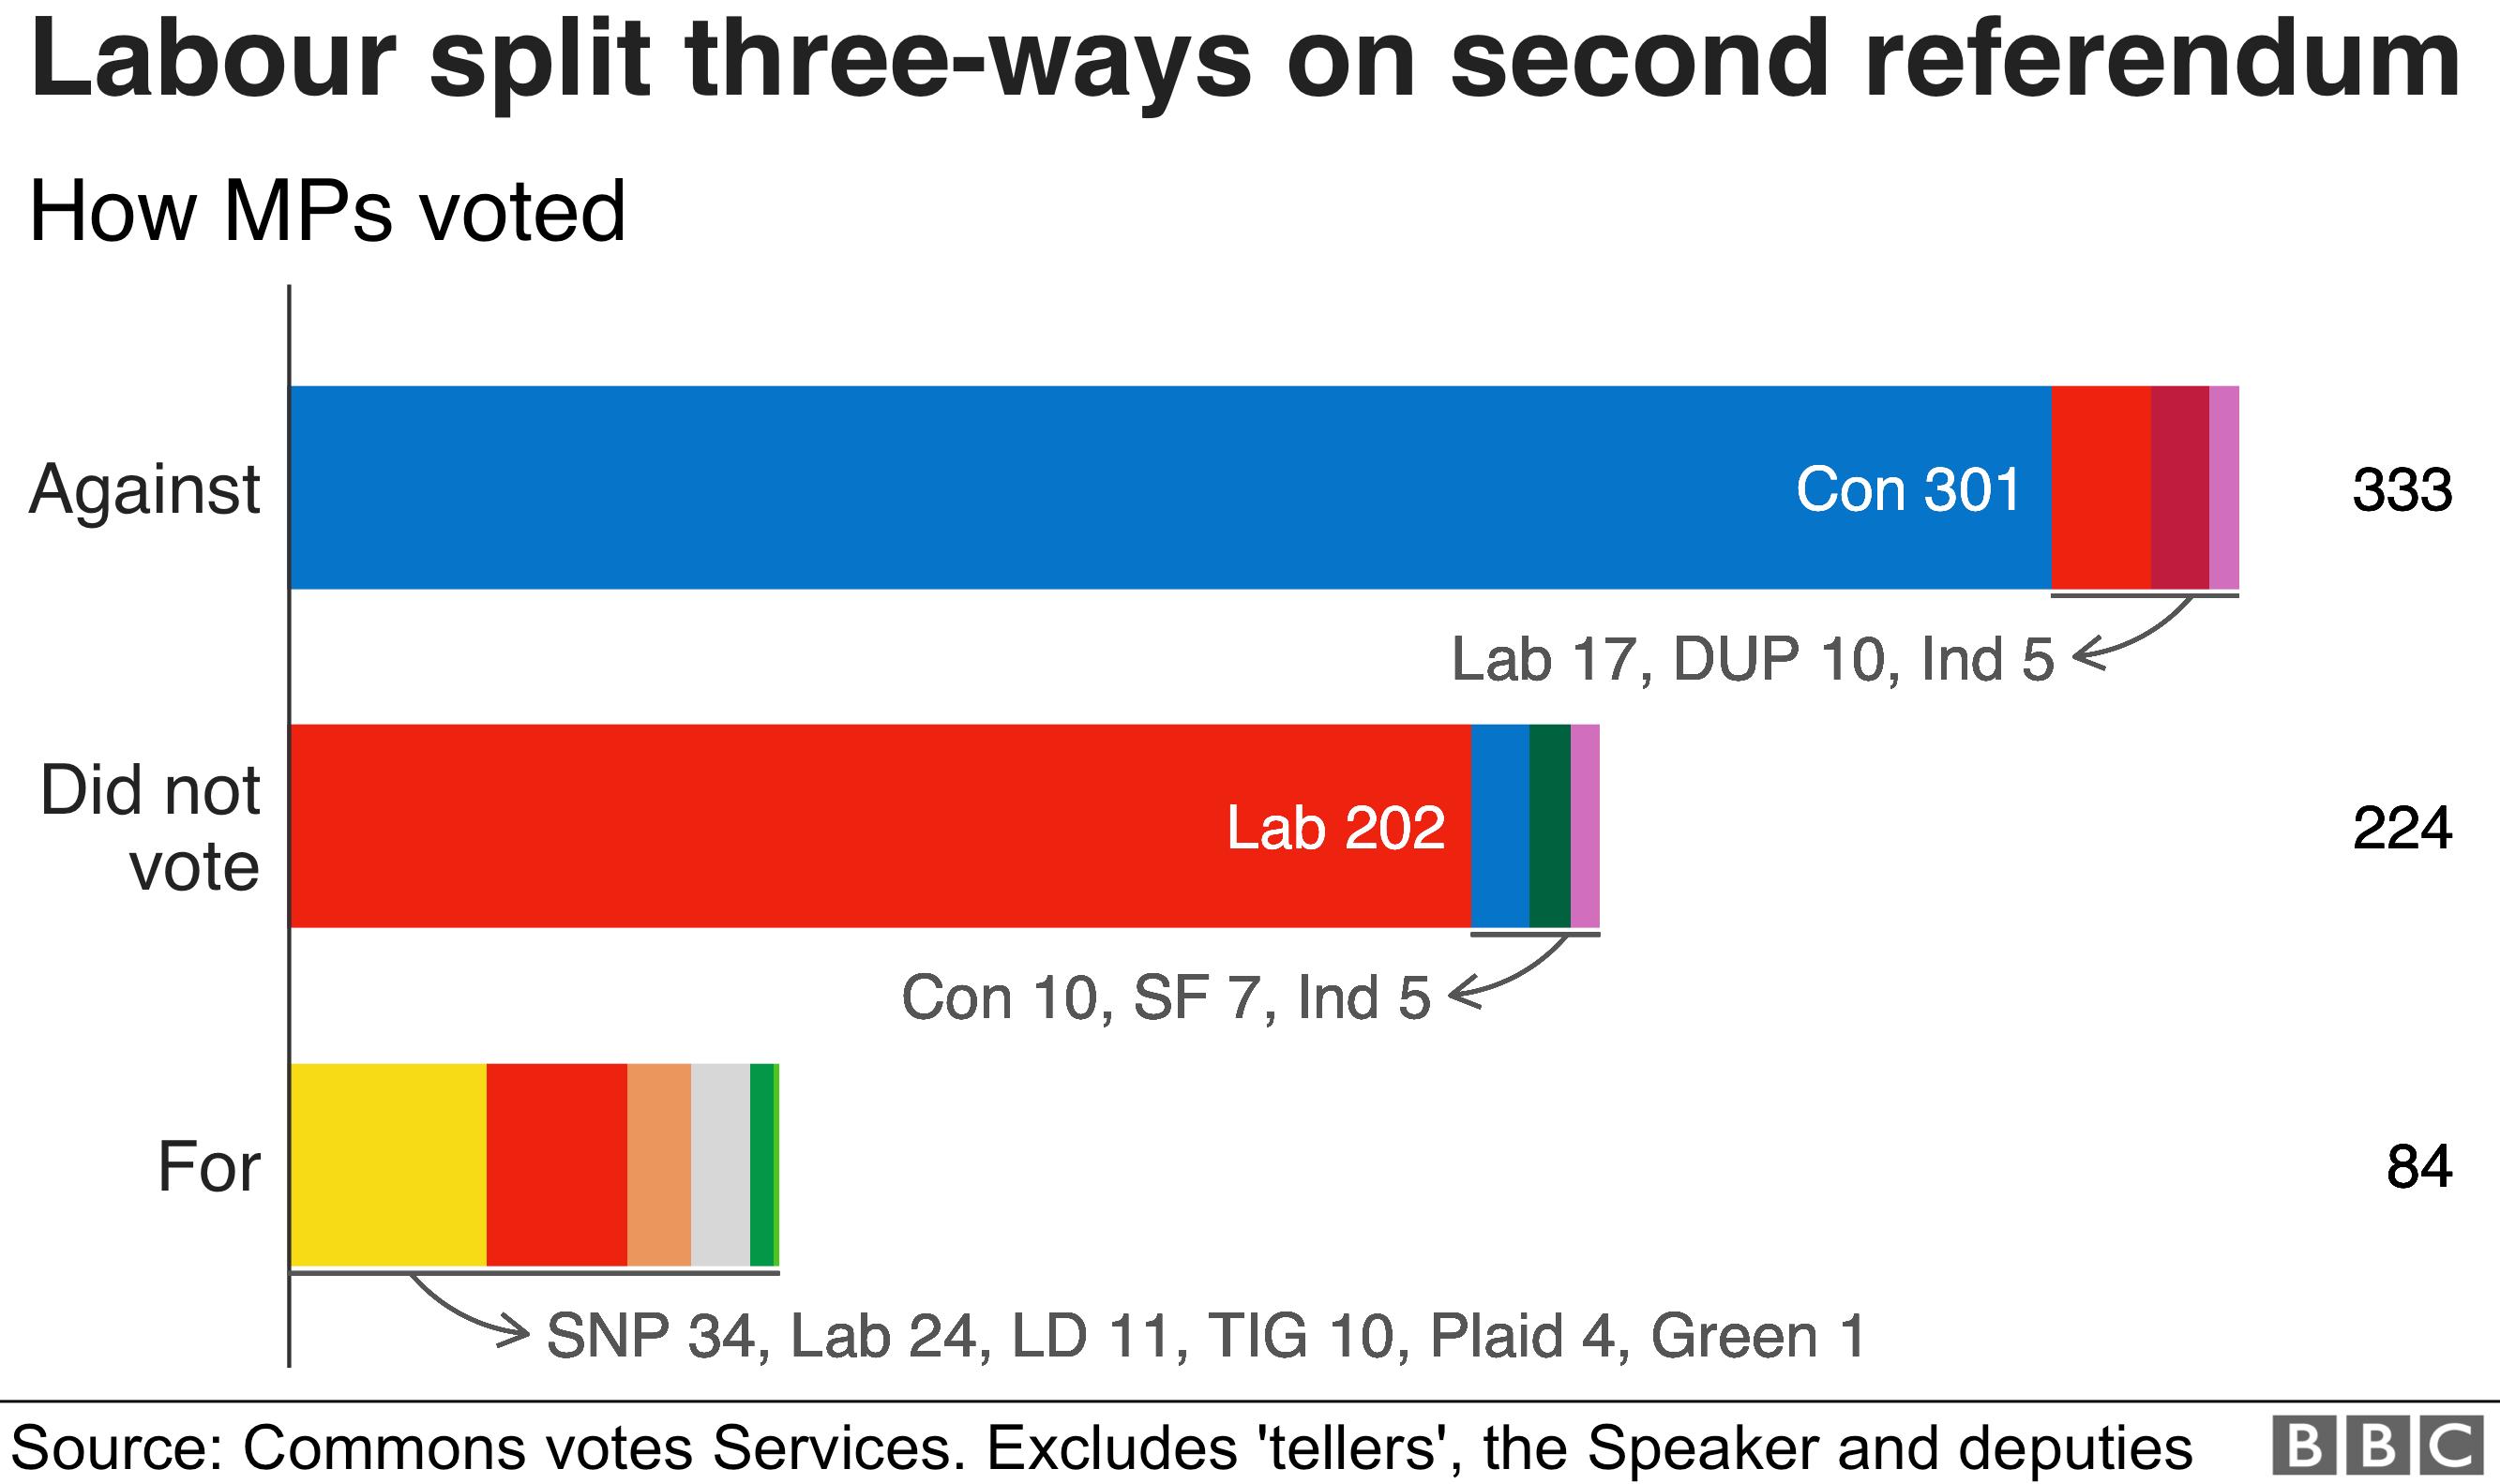 Labour split on referendum